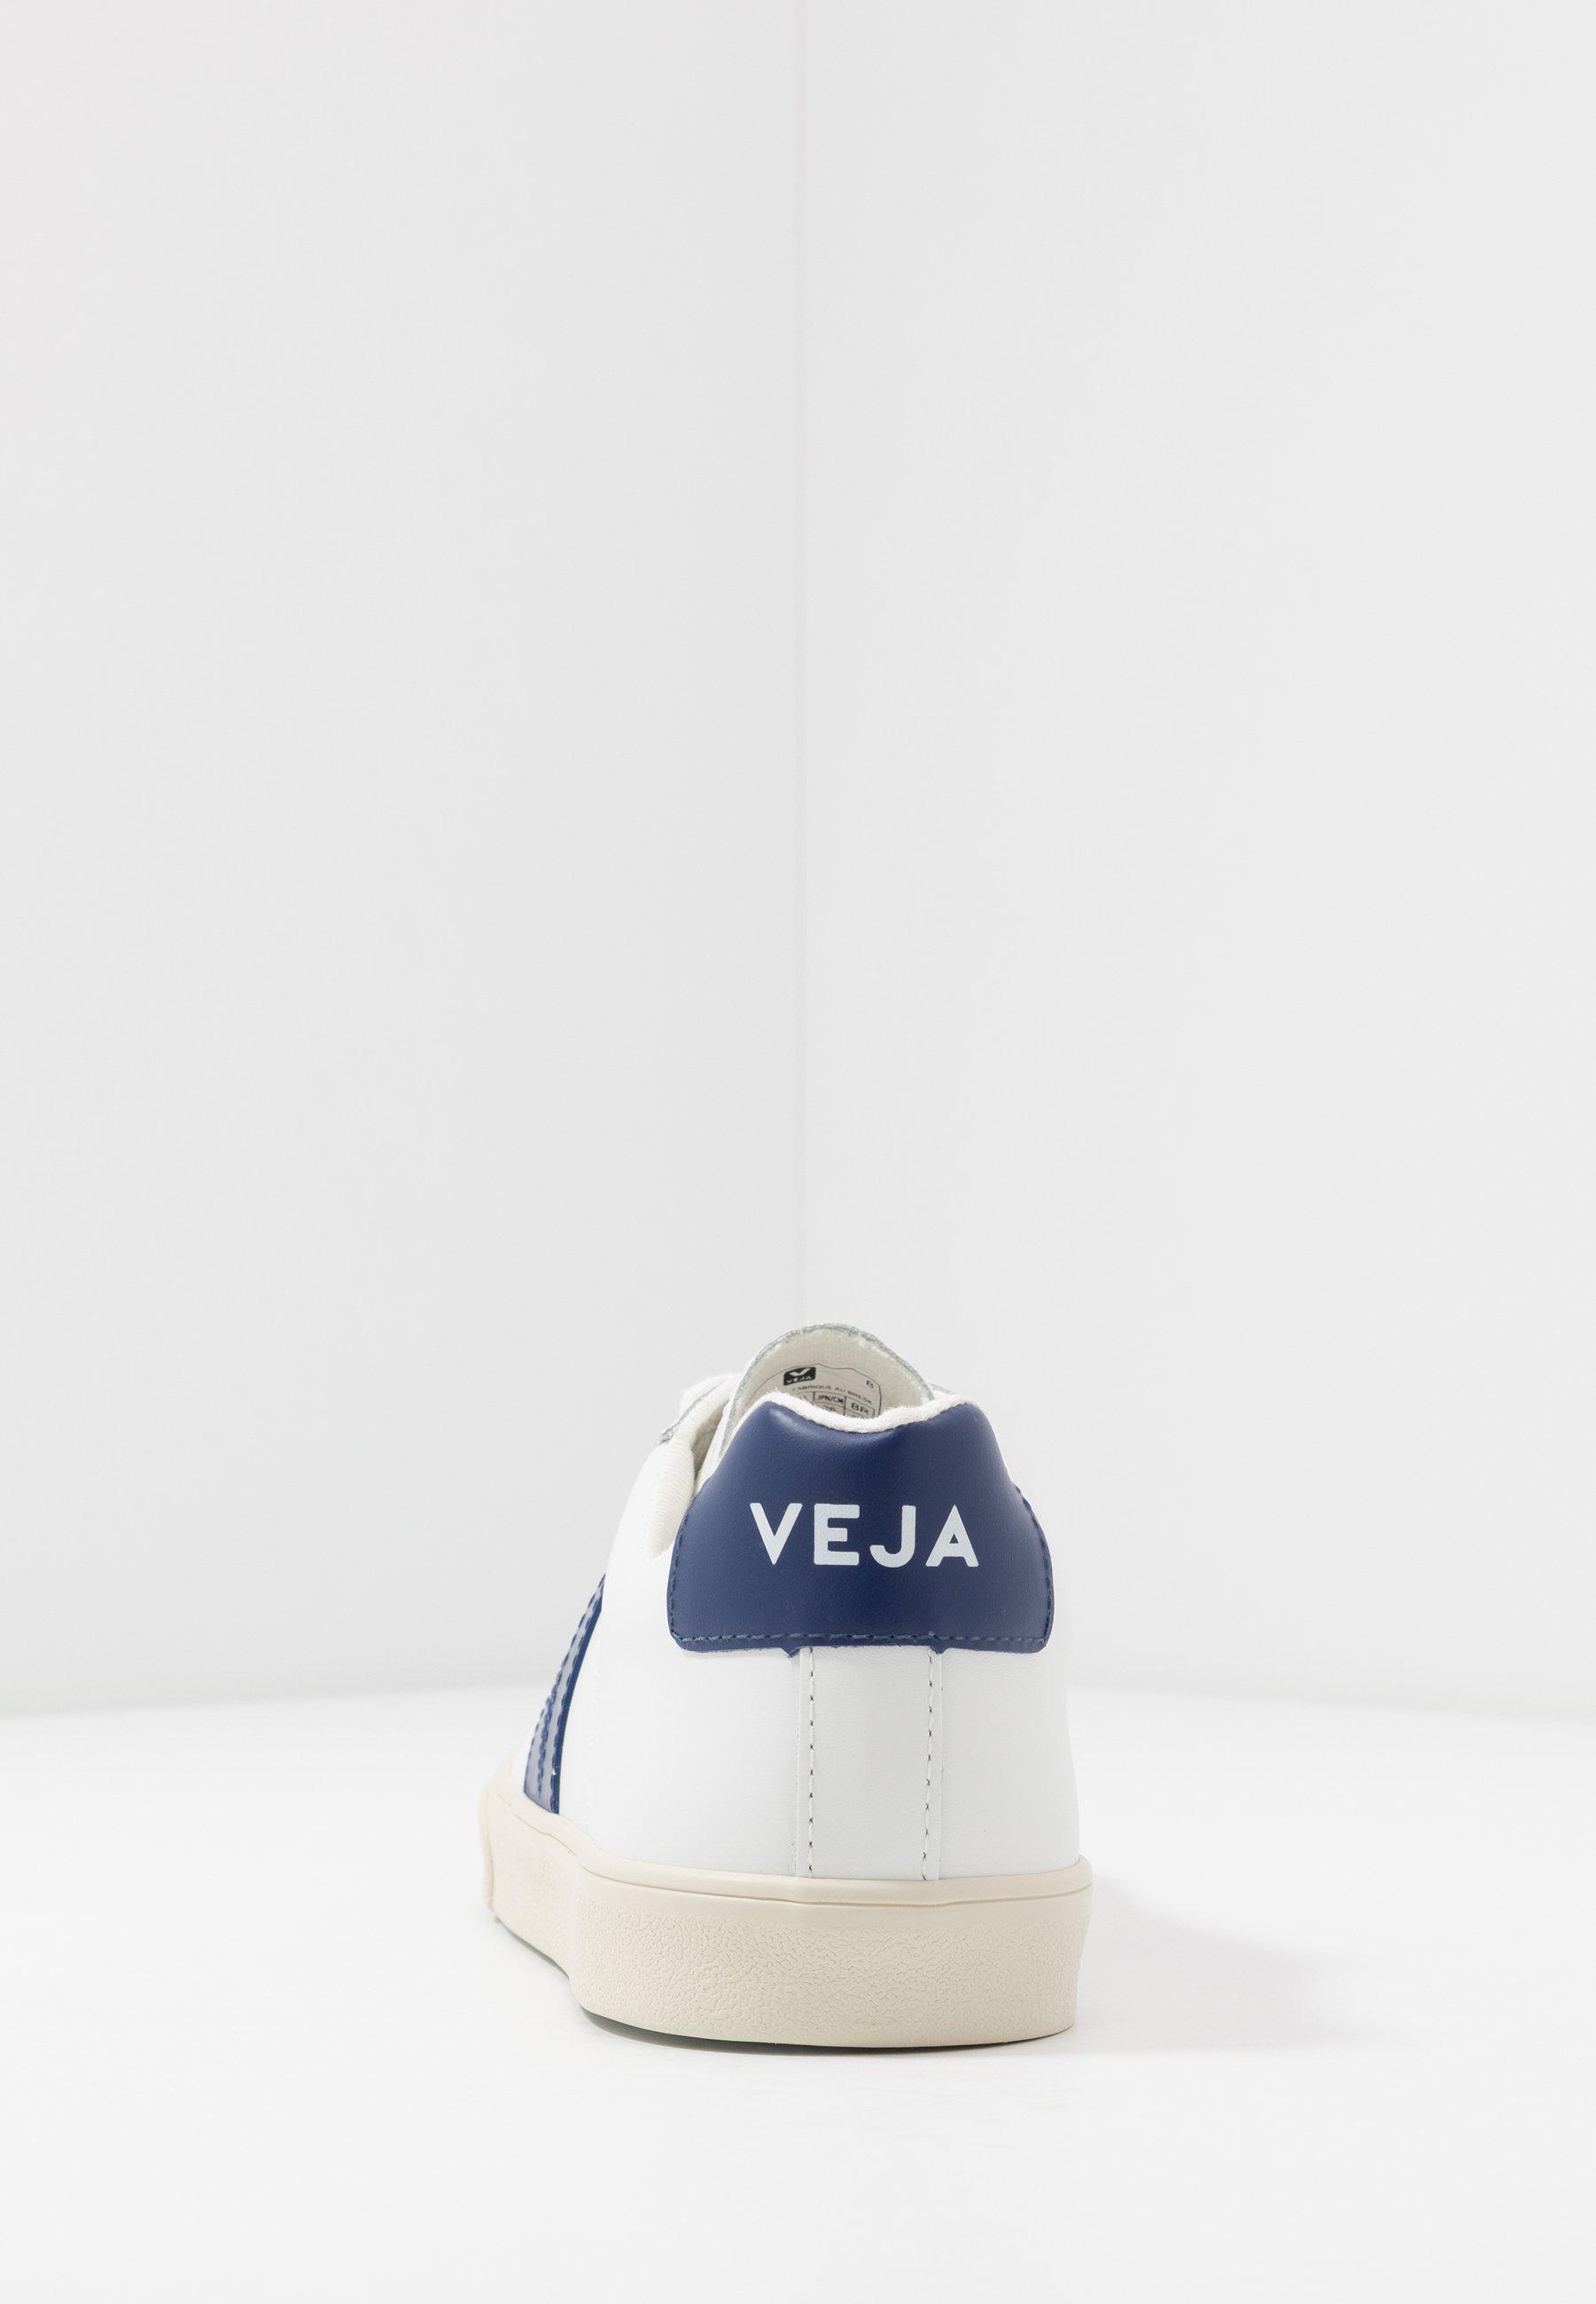 Veja Esplar Logo - Sneakers Extra White/cobalt